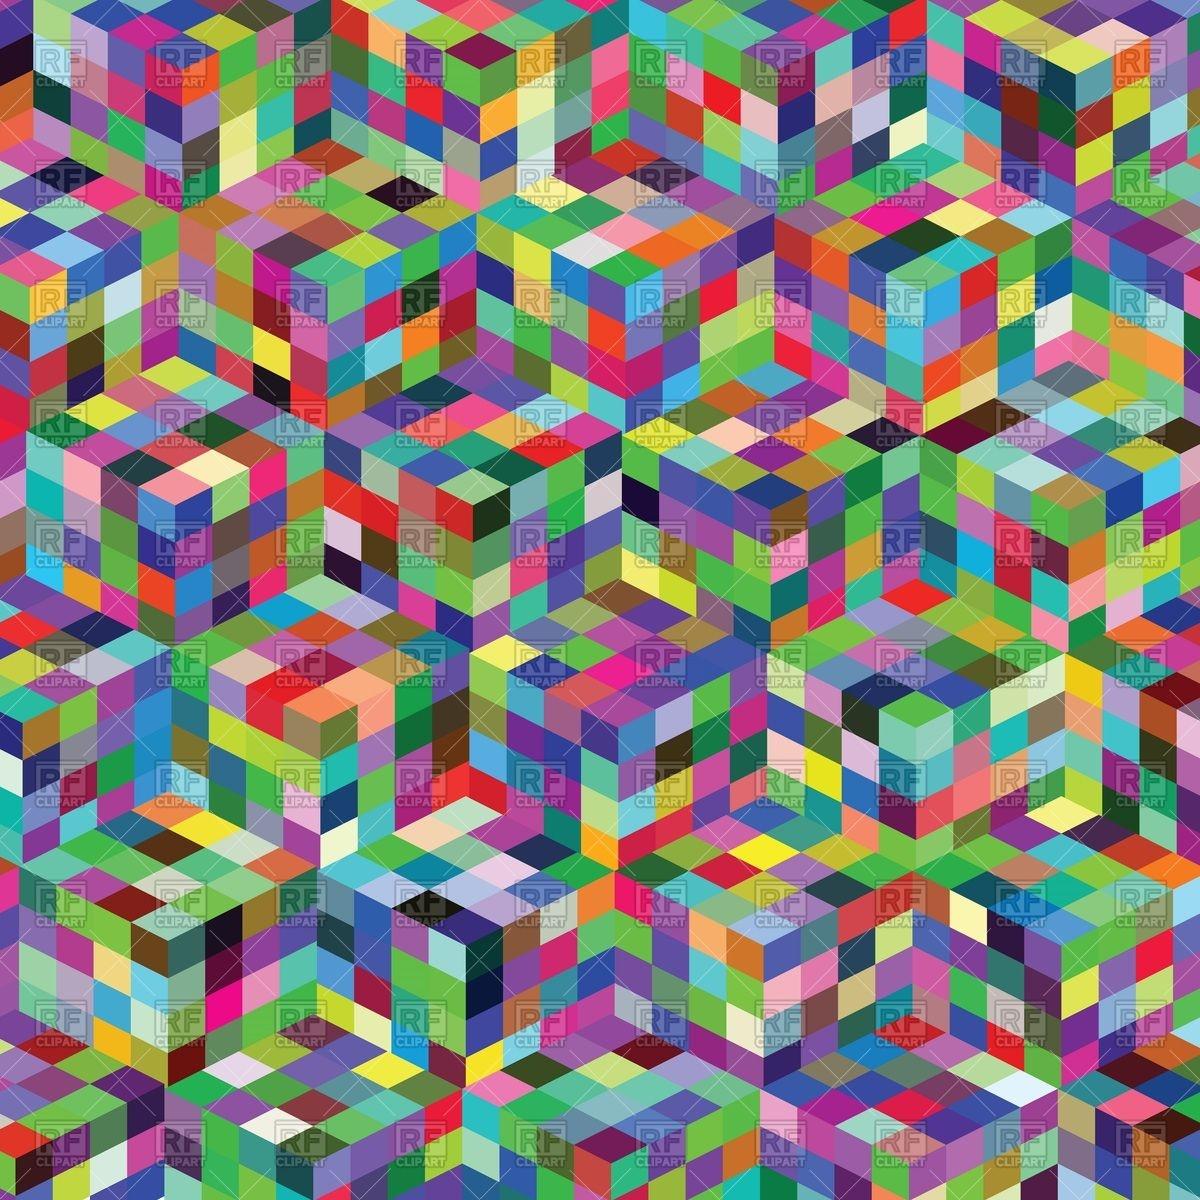 Variegated kaleidoscopic pattern.